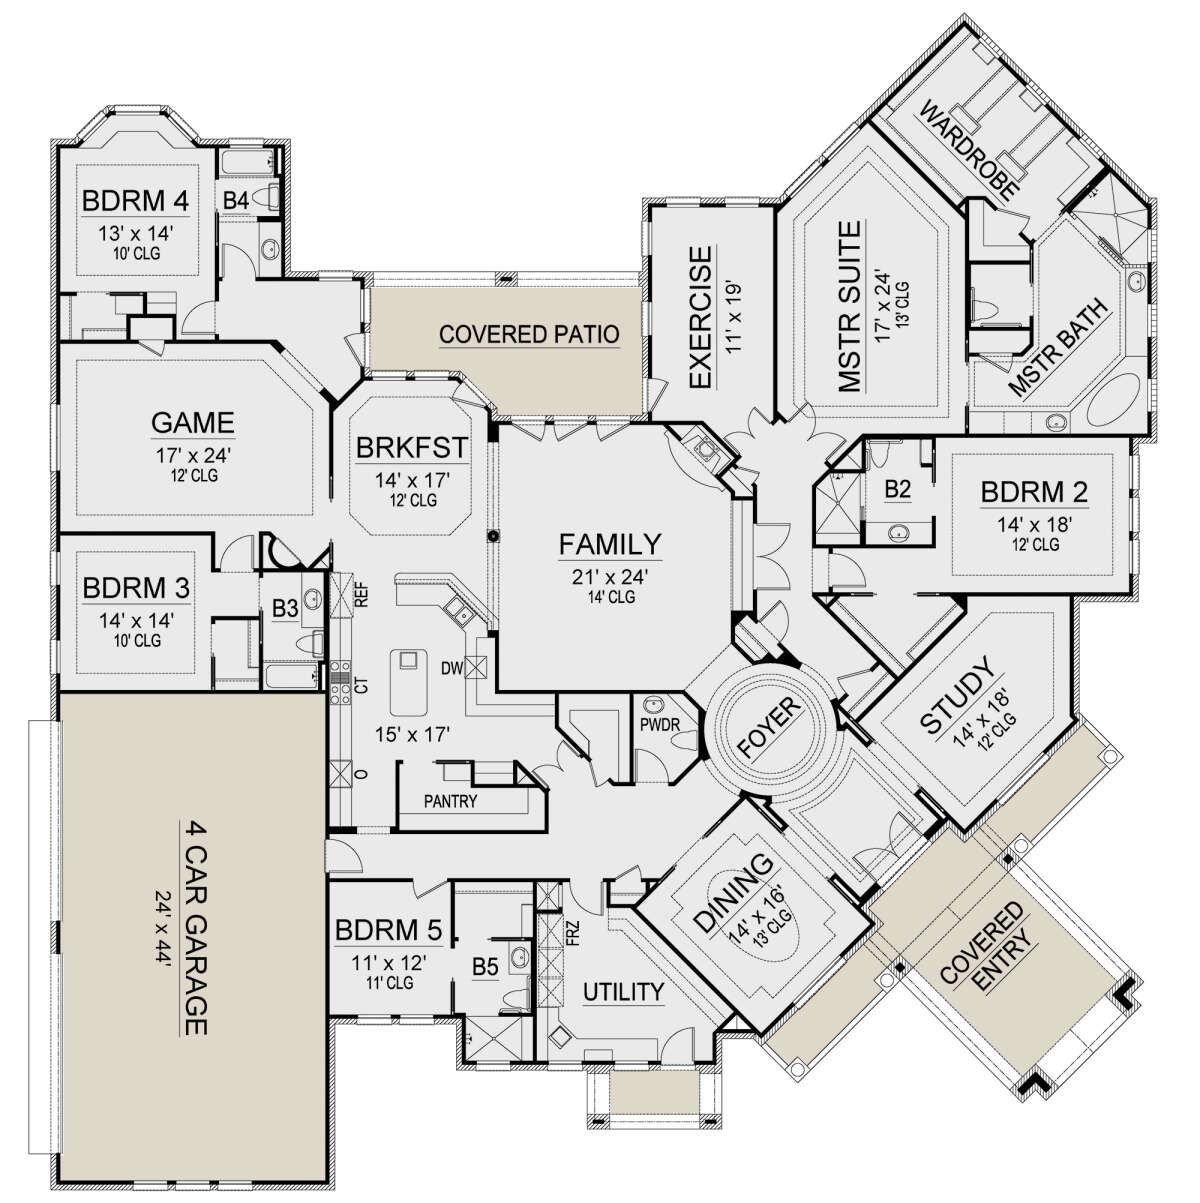 House Plan 5445 00397 Luxury Plan 6 091 Square Feet 5 Bedrooms 5 5 Bathrooms In 2021 Luxury Plan Mansion Floor Plan Luxury House Floor Plans